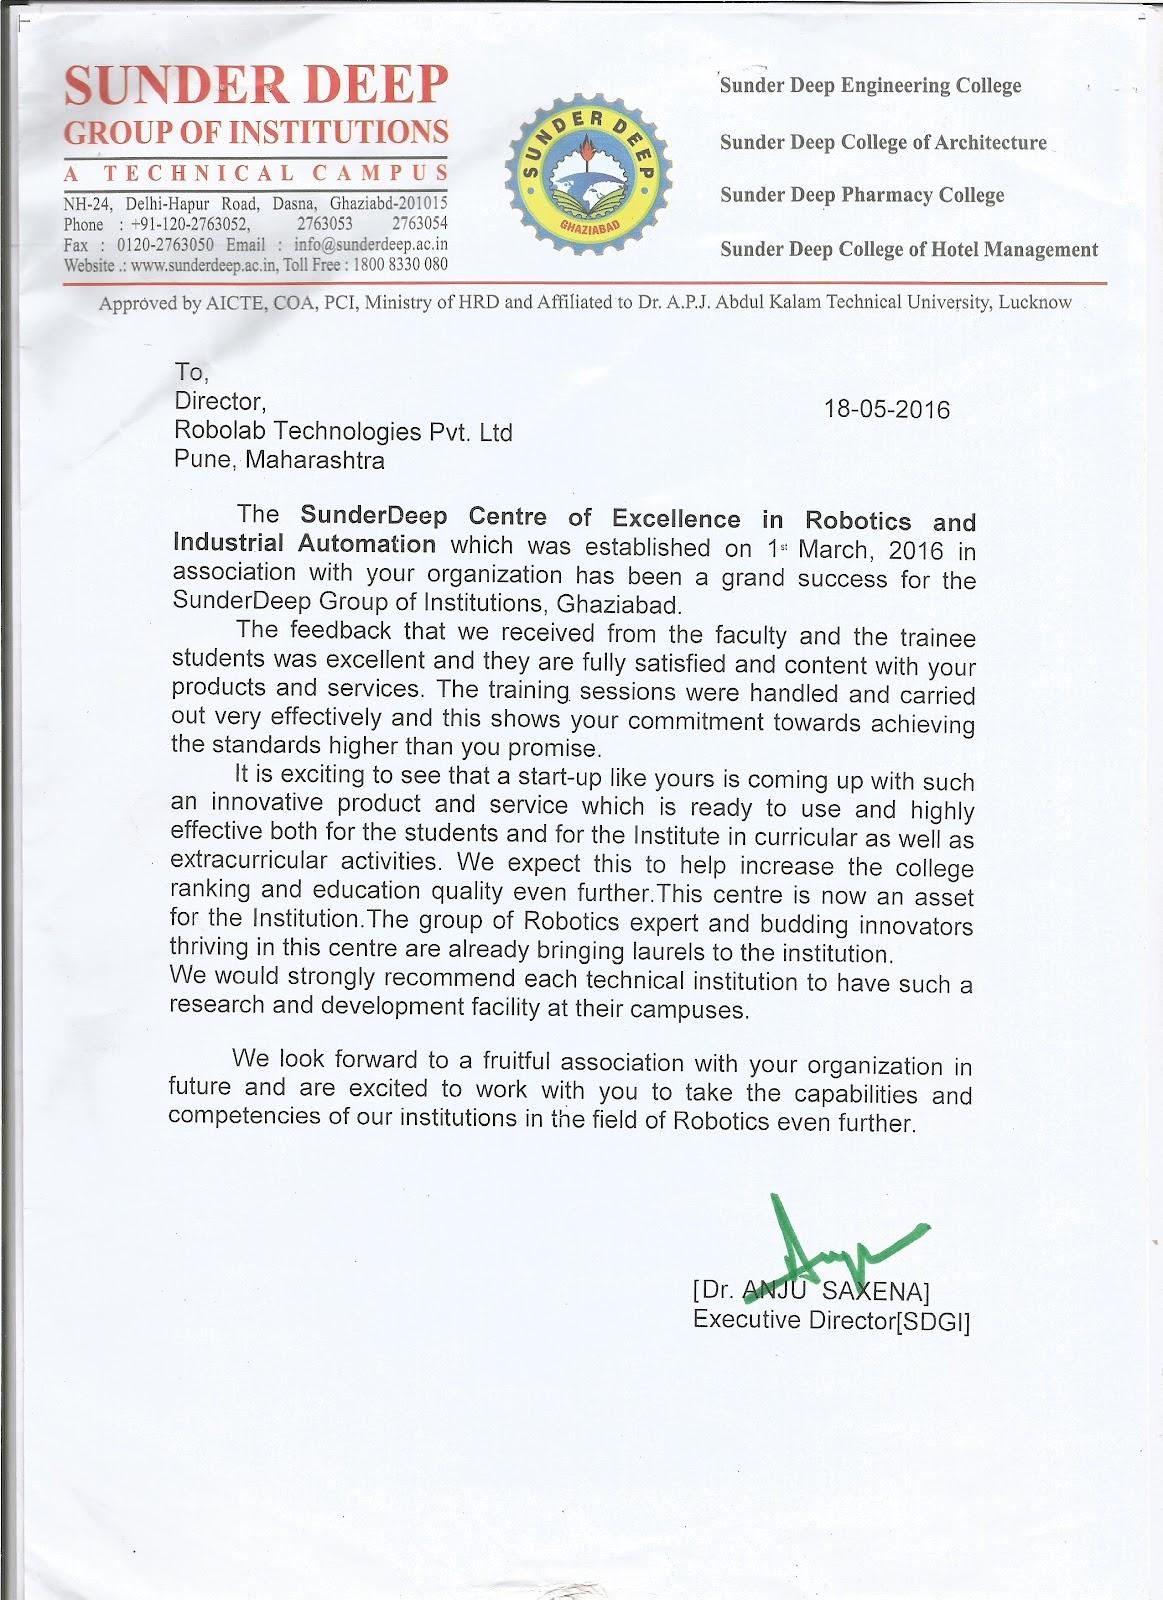 SunderDeep Group of Institutions, Ghaziabad Robolab (63).jpg